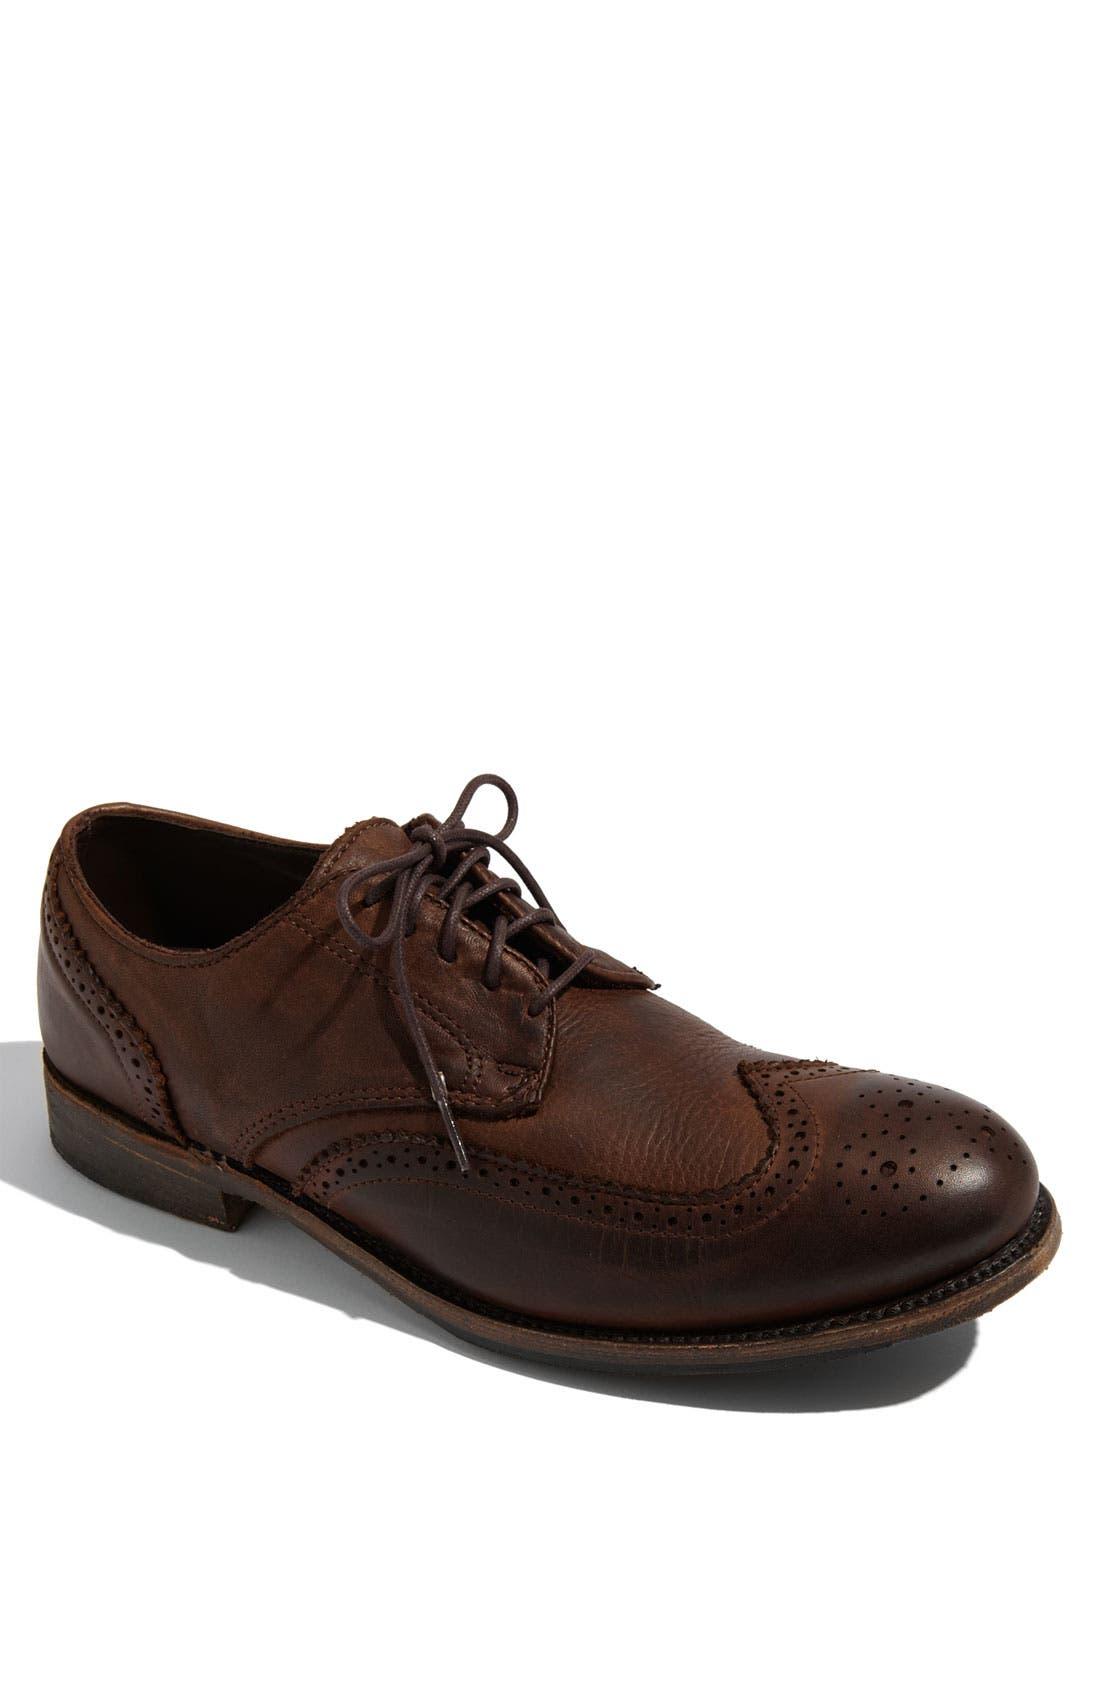 Main Image - Vintage Shoe Company 'Langdon' Wingtip Oxford